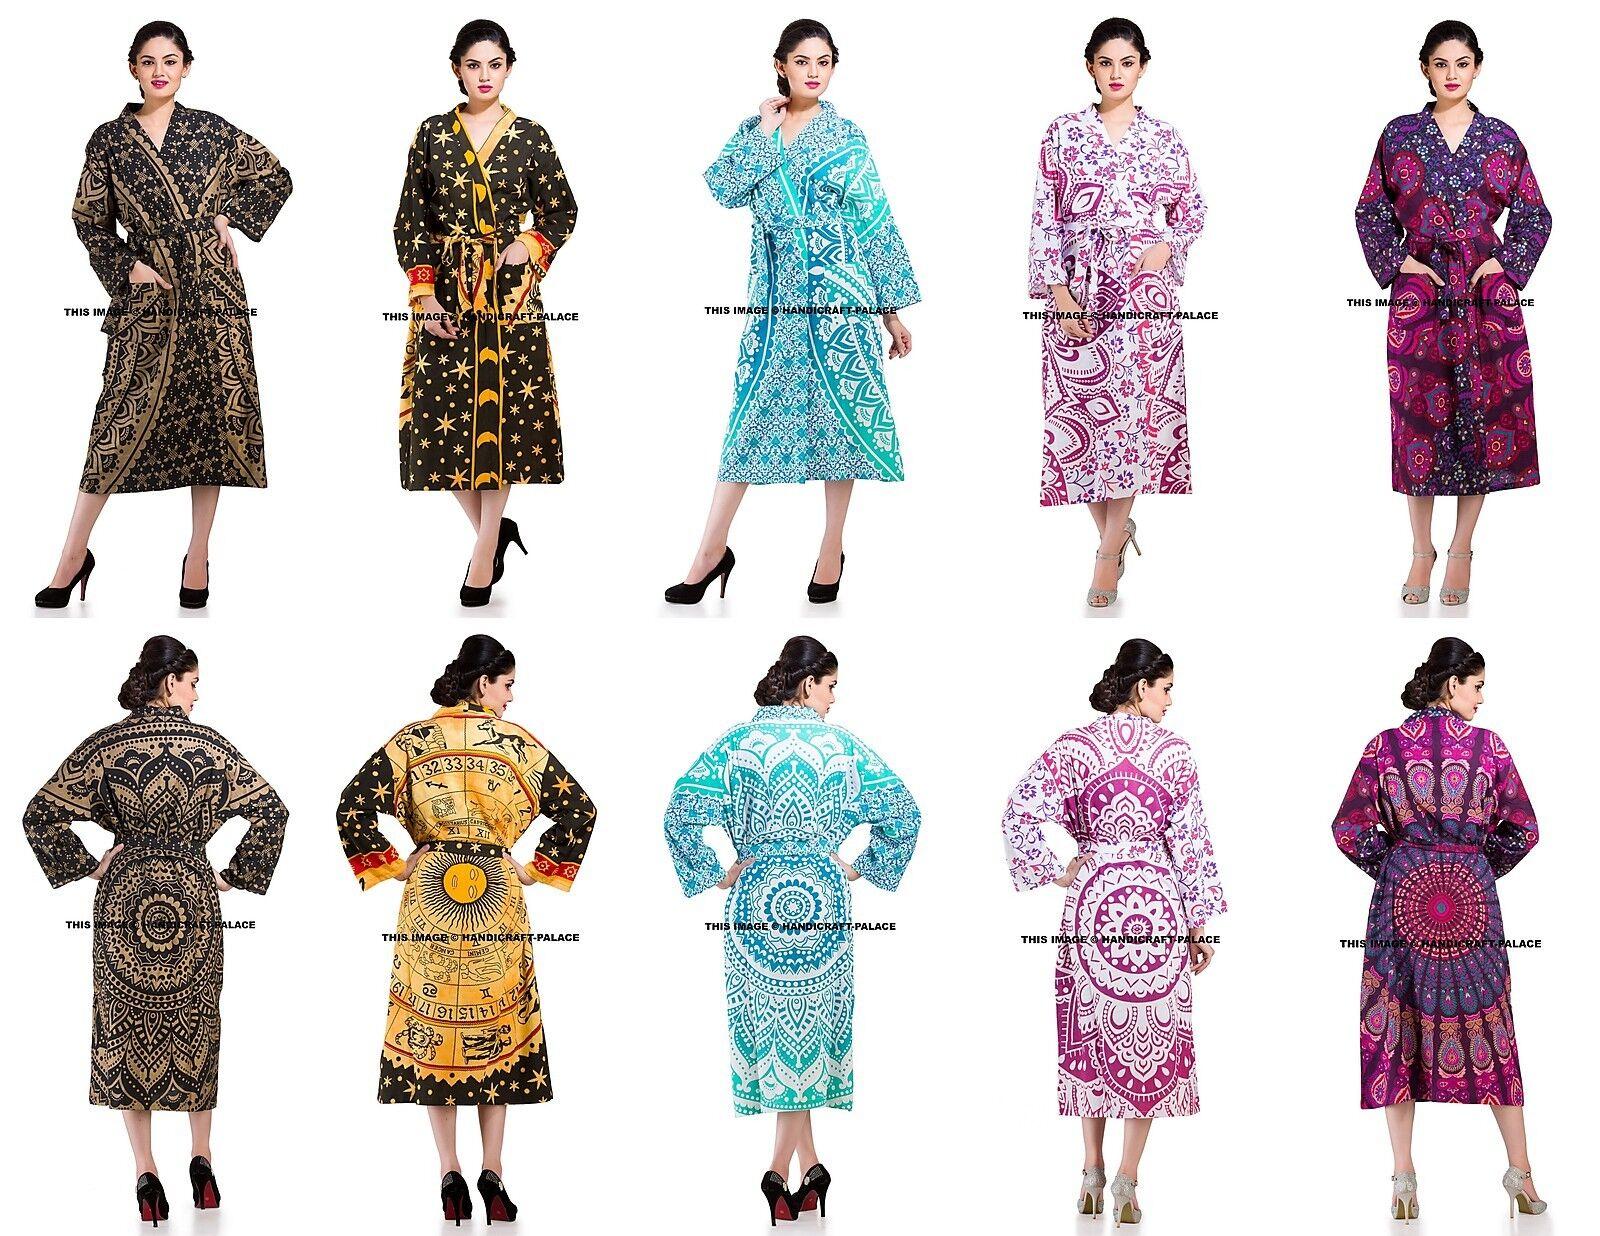 5 PC LOT Indian Mandala Bath Robe Evening Gown Nightwear Lingerie Cover Up Boho